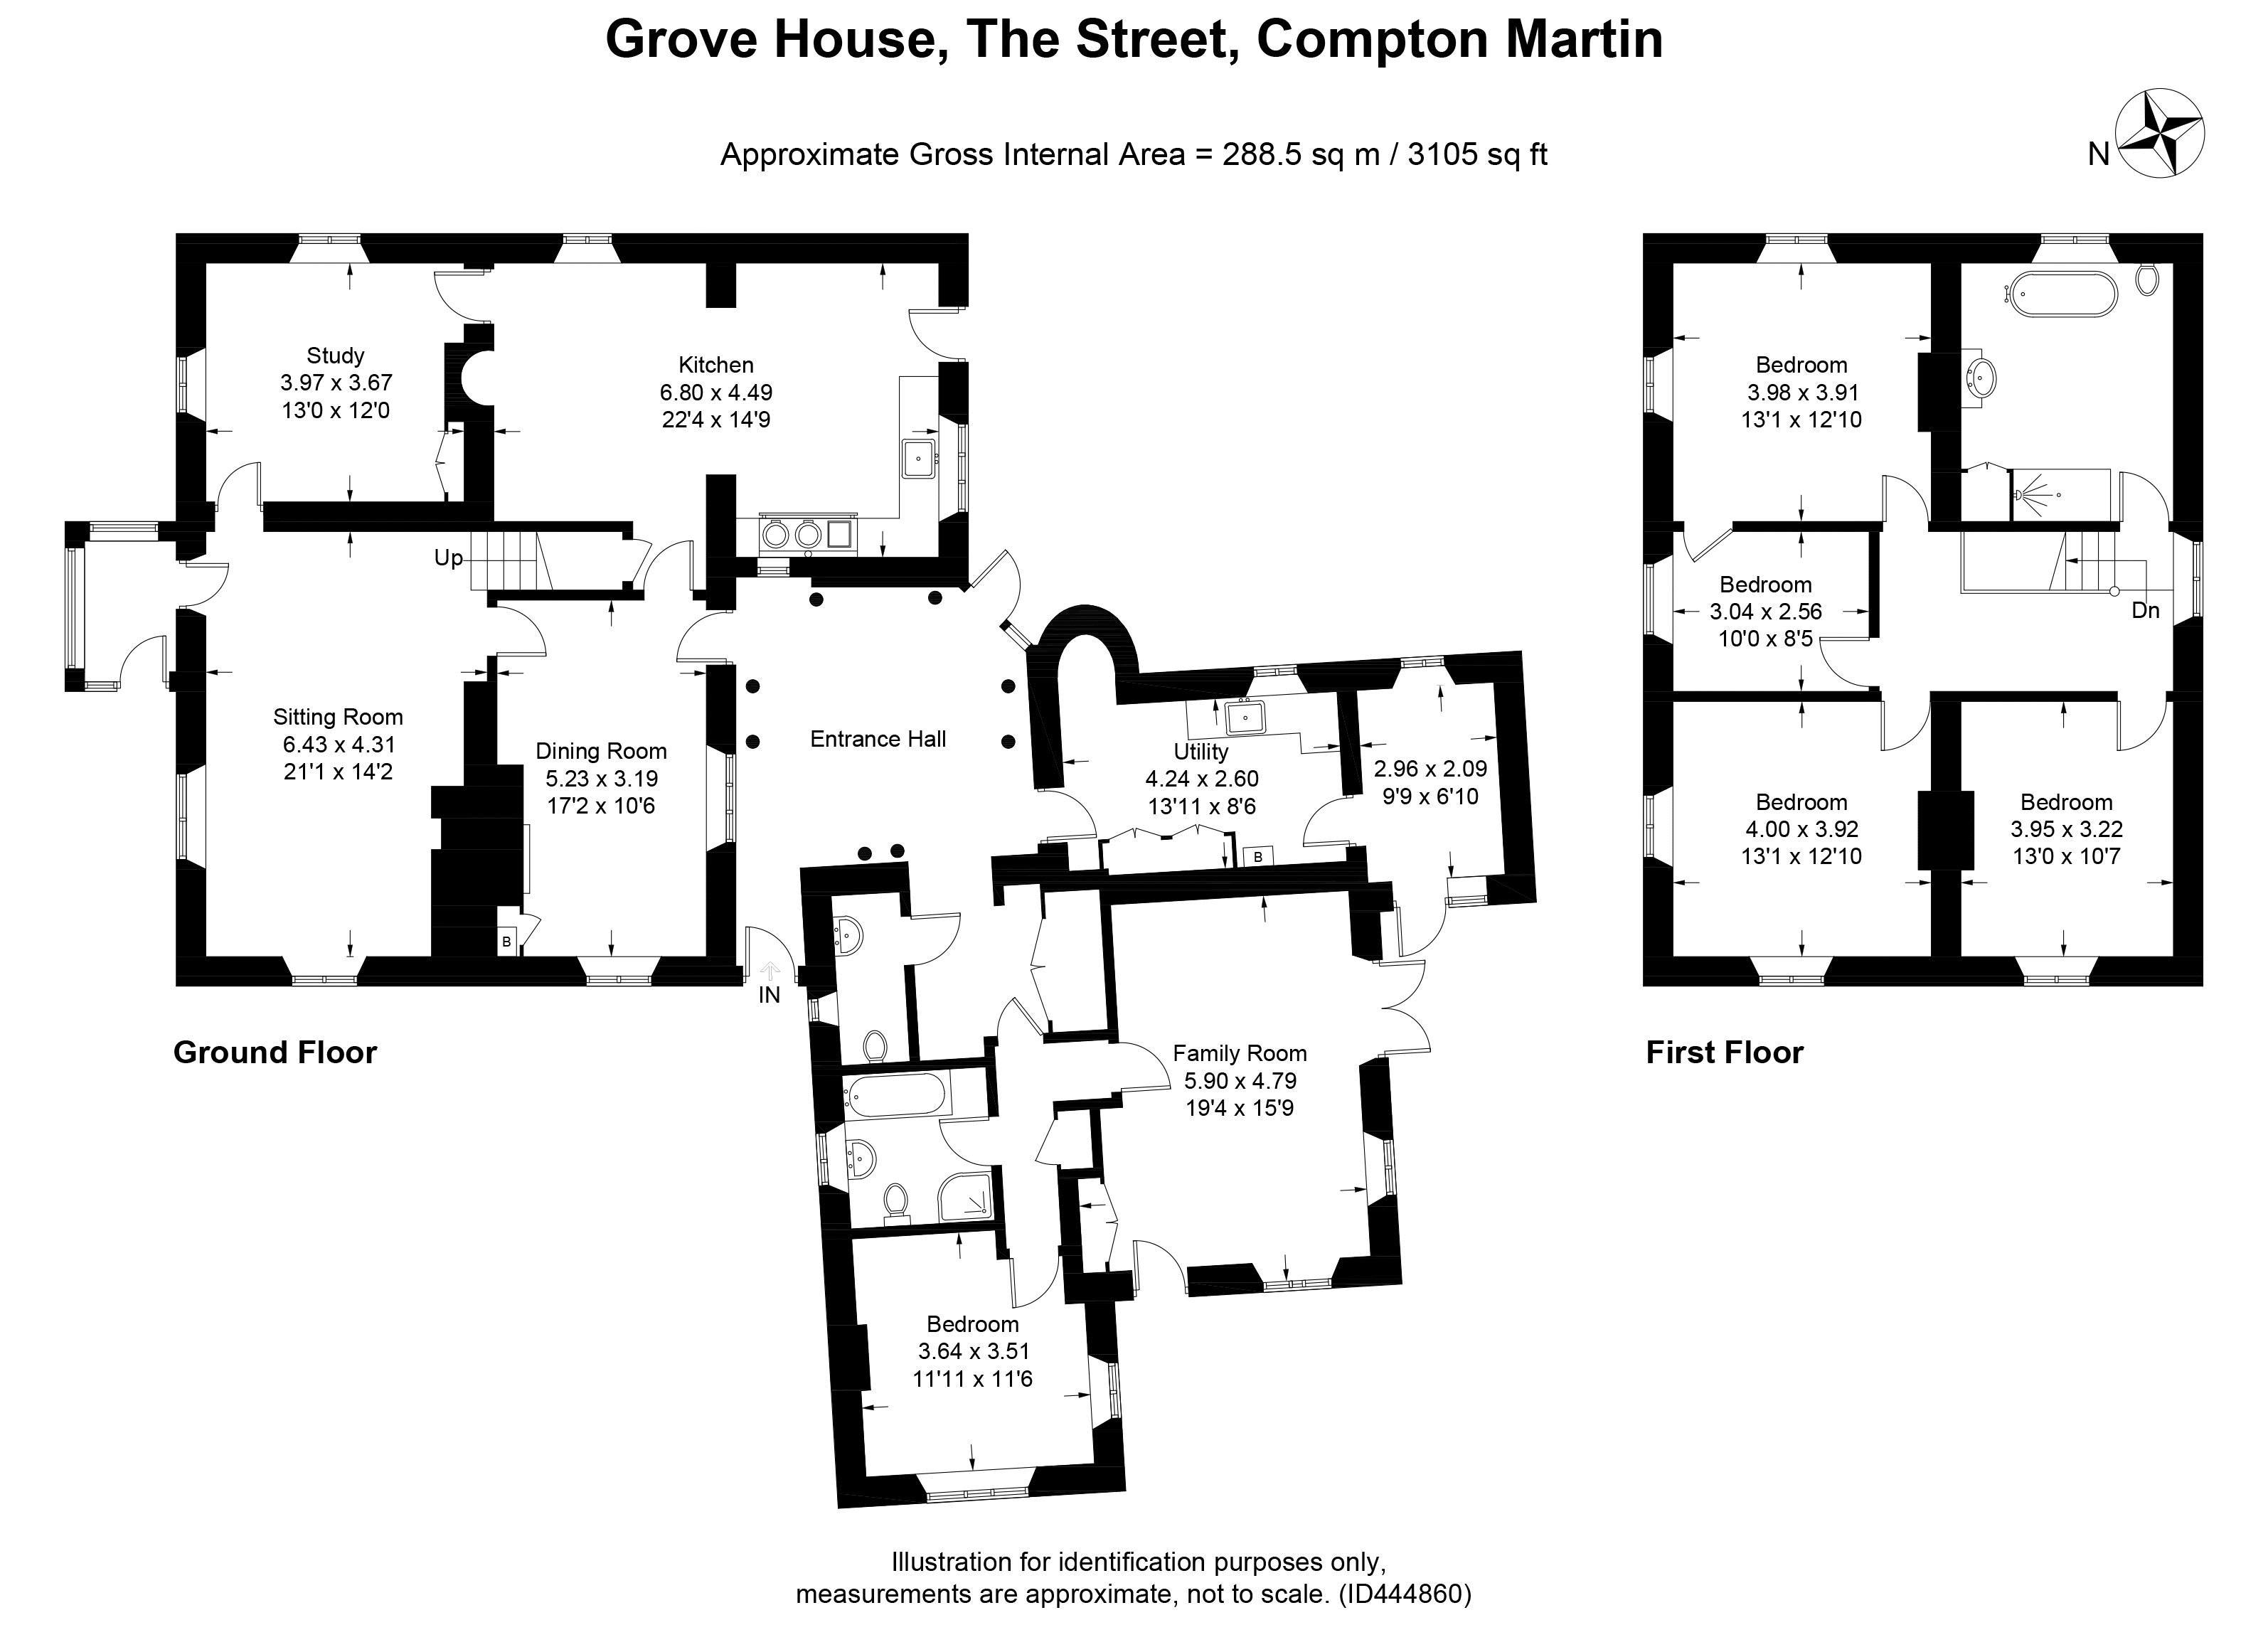 The Street Compton Martin